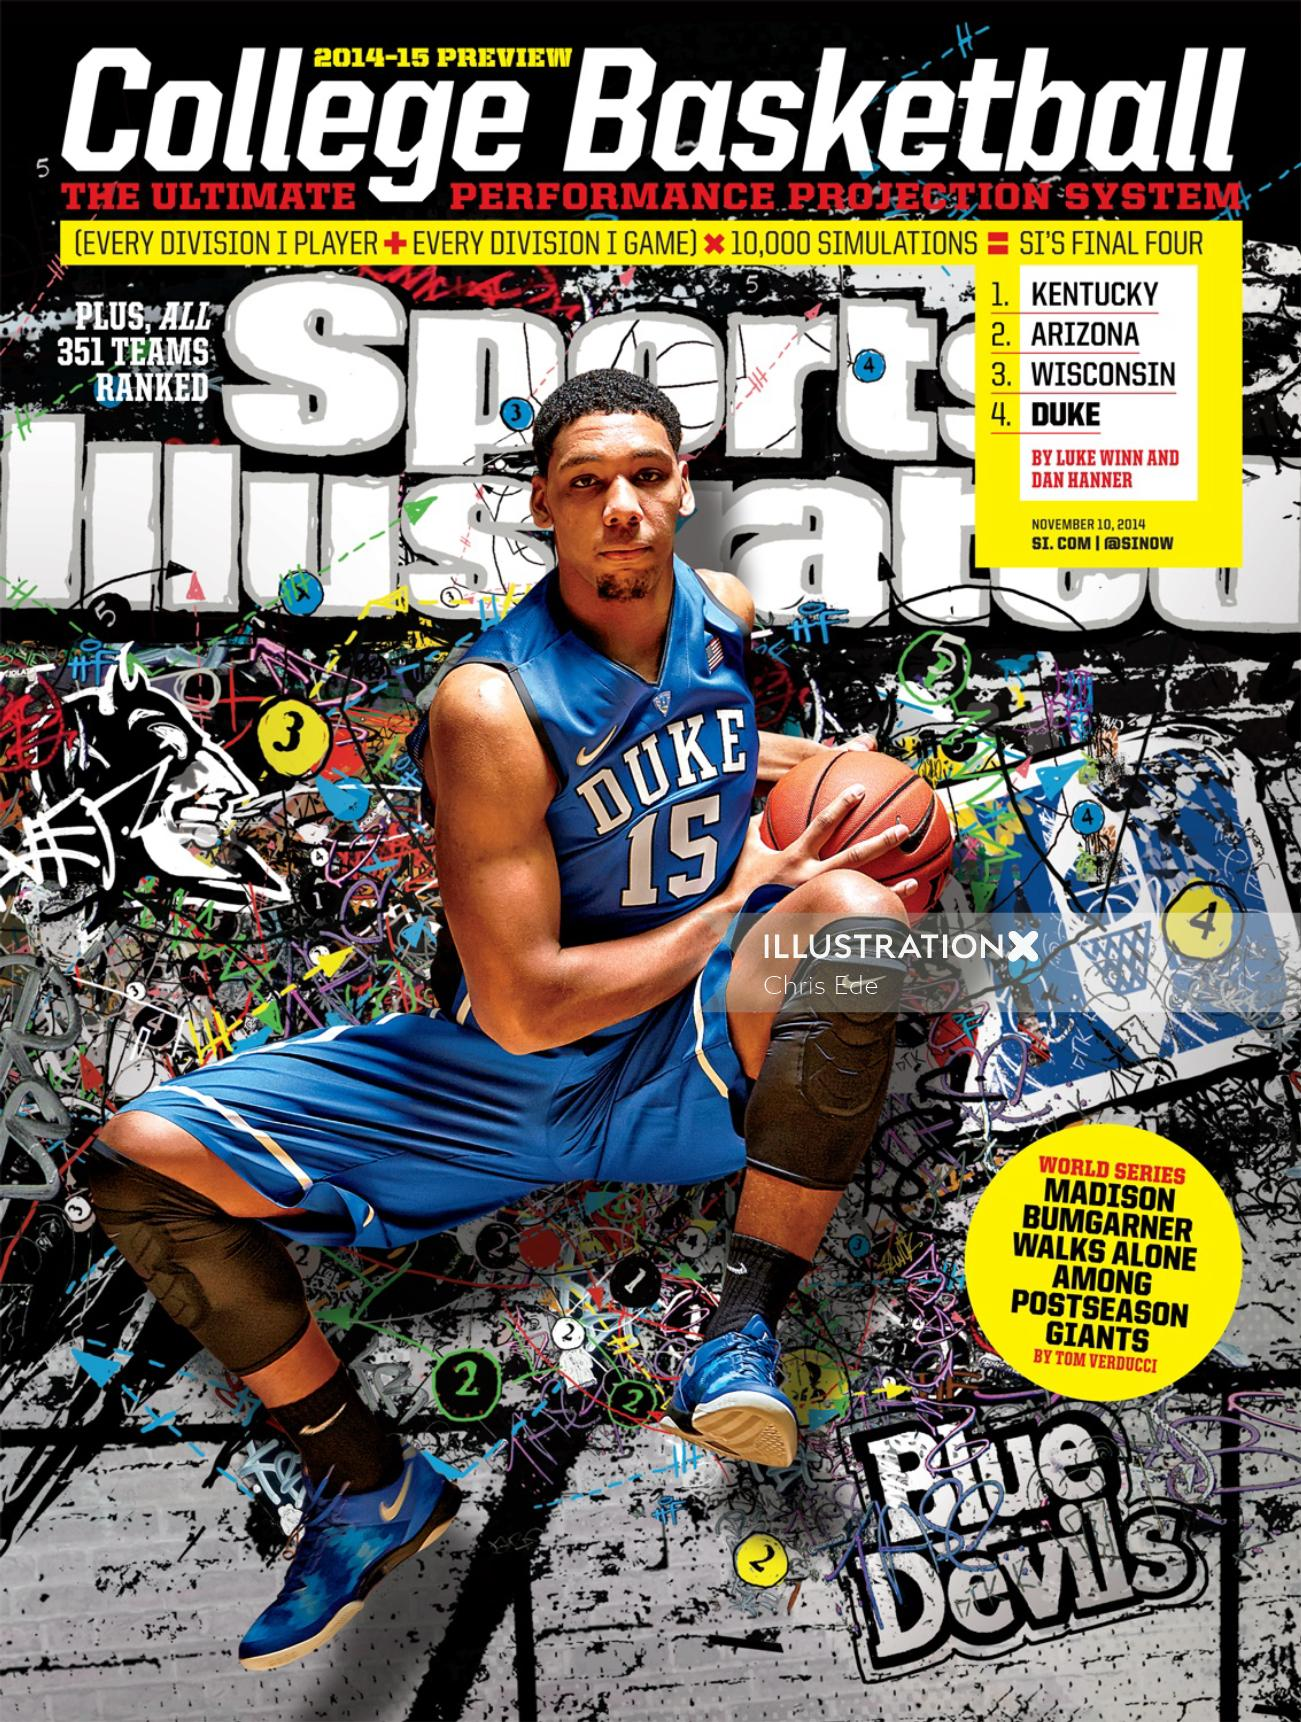 Basket ball magazine cover illustration by Chris Ede